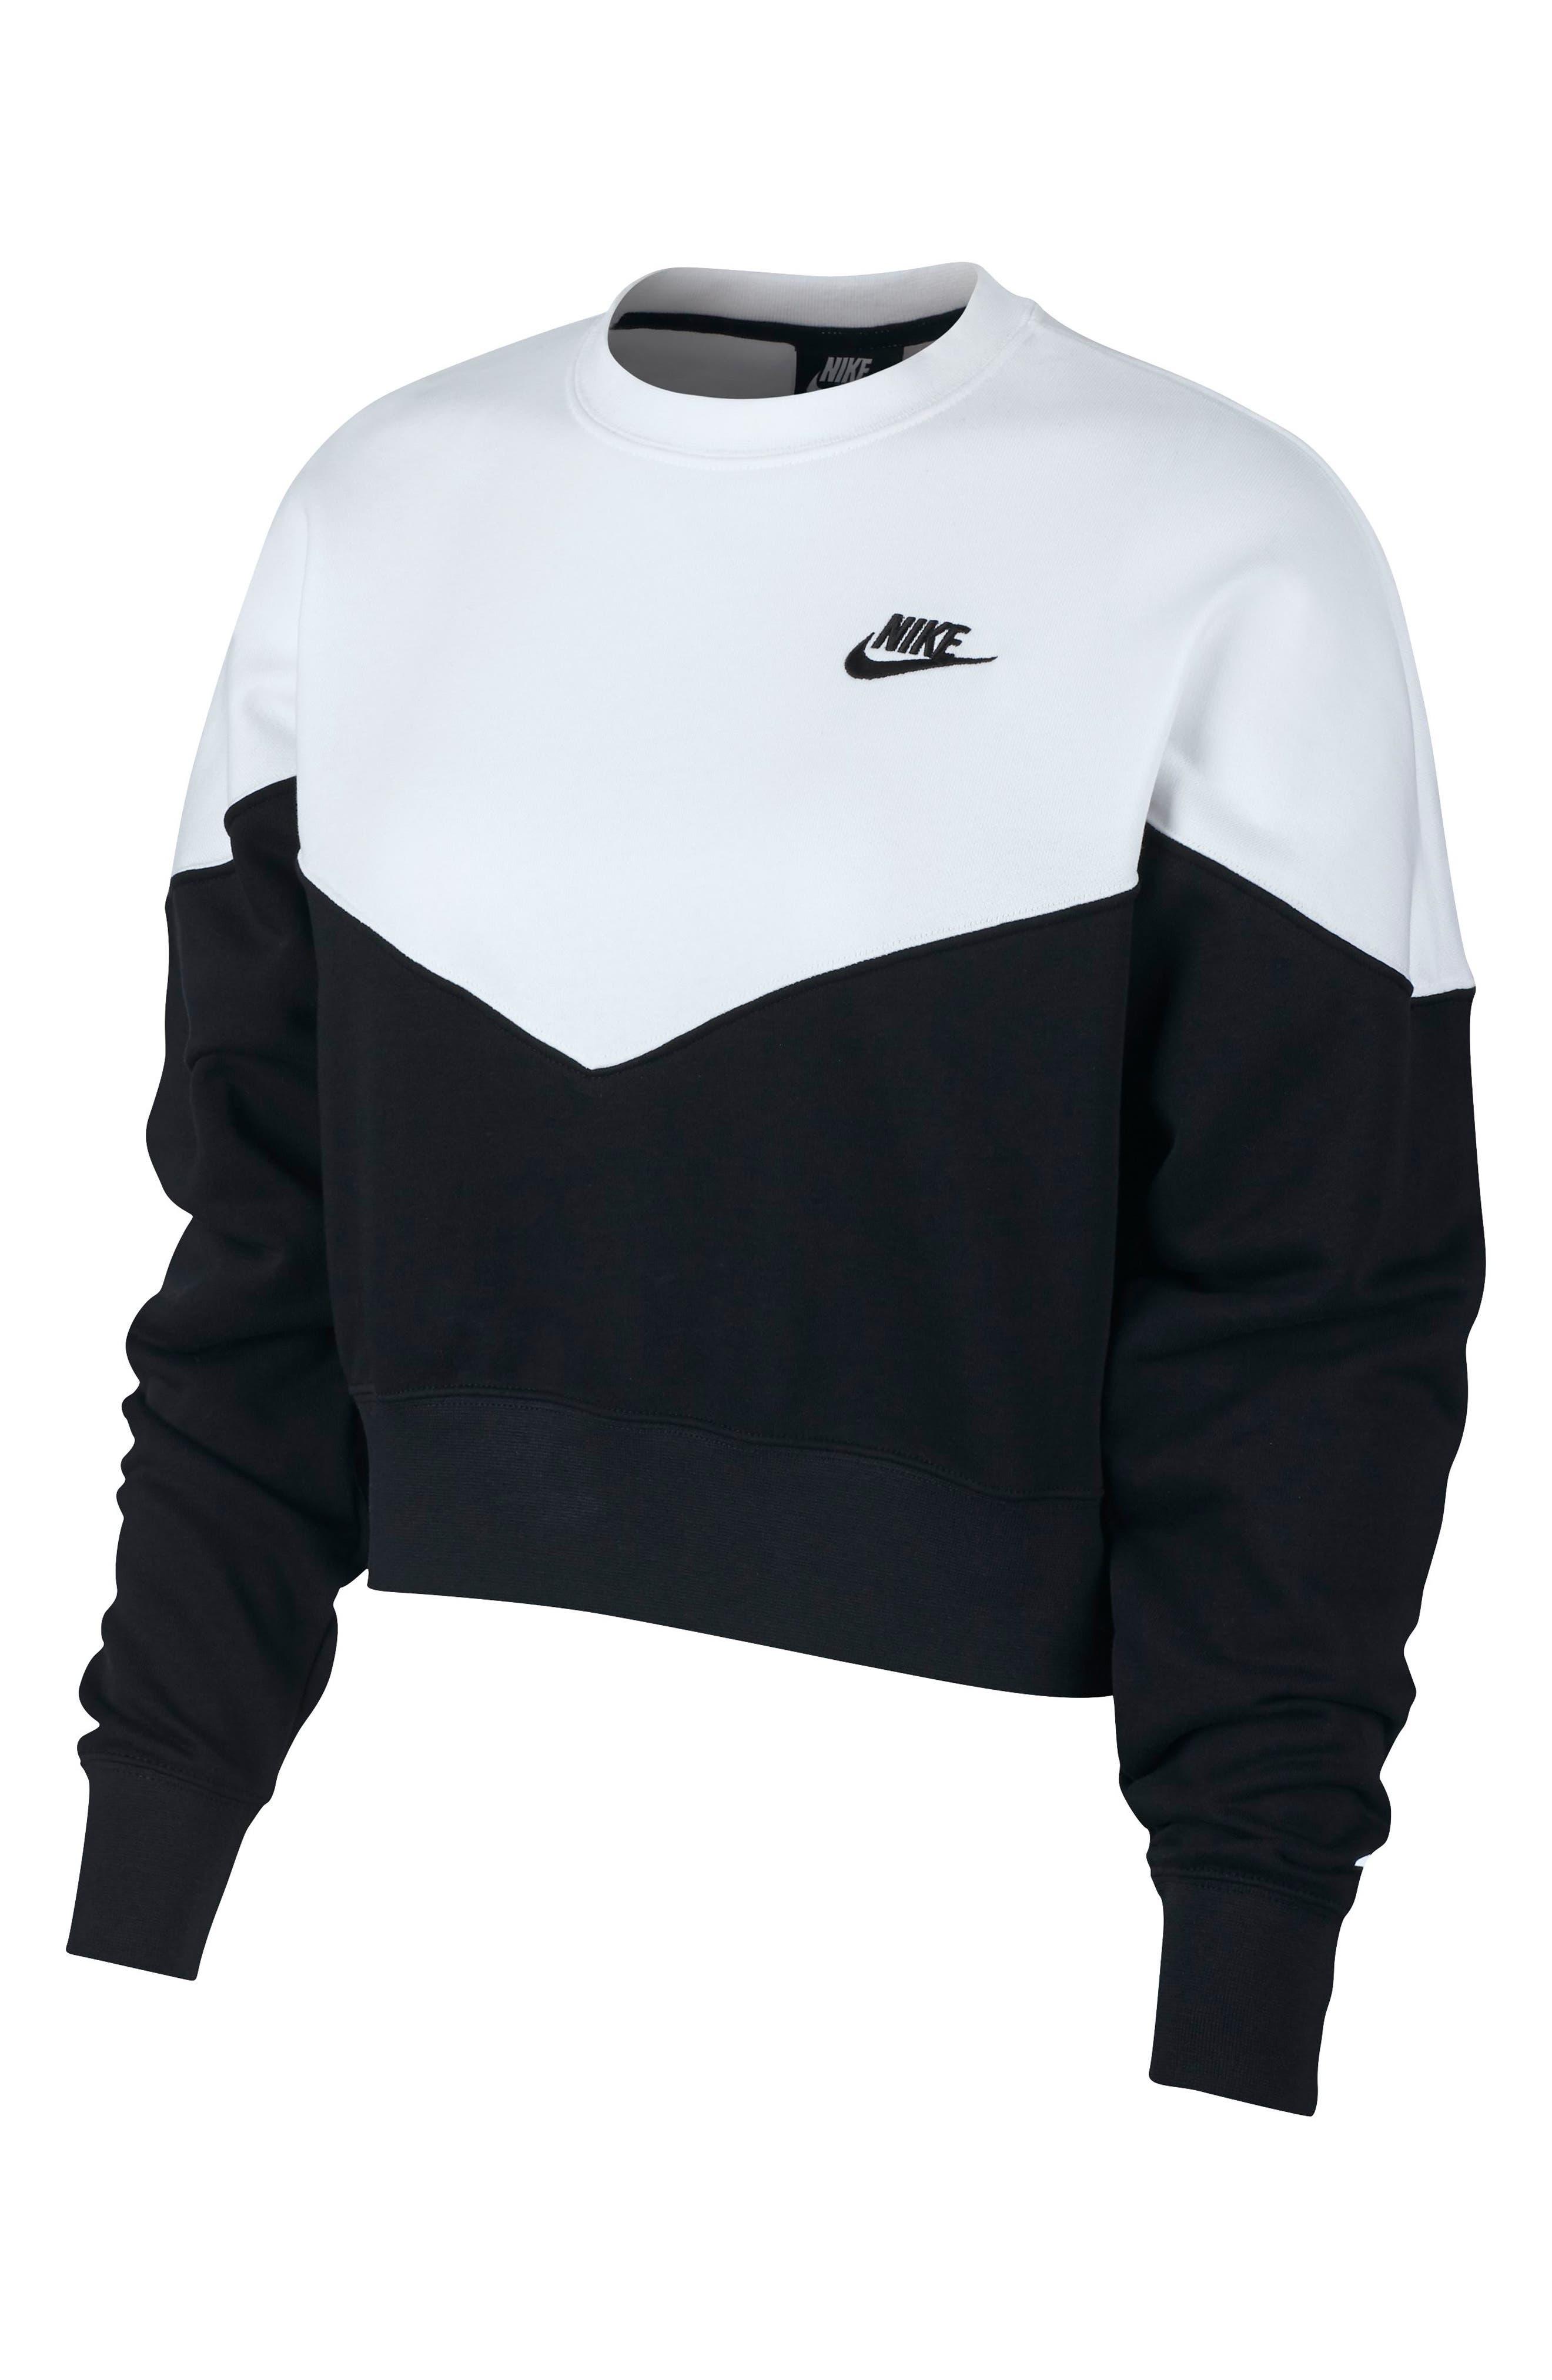 NIKE Sportswear Heritage Fleece Sweatshirt, Main, color, BLACK/ WHITE/ BLACK